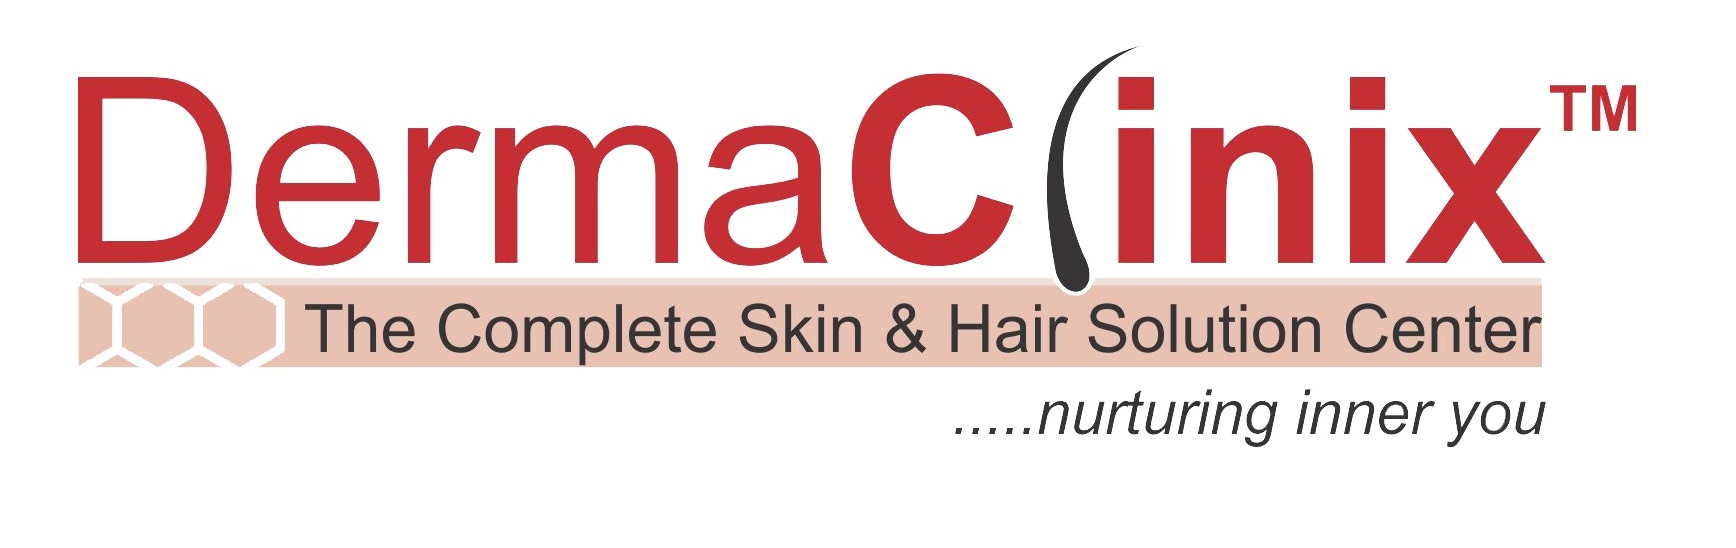 DermaClinix - The Complete Skin & Hair Solution Center